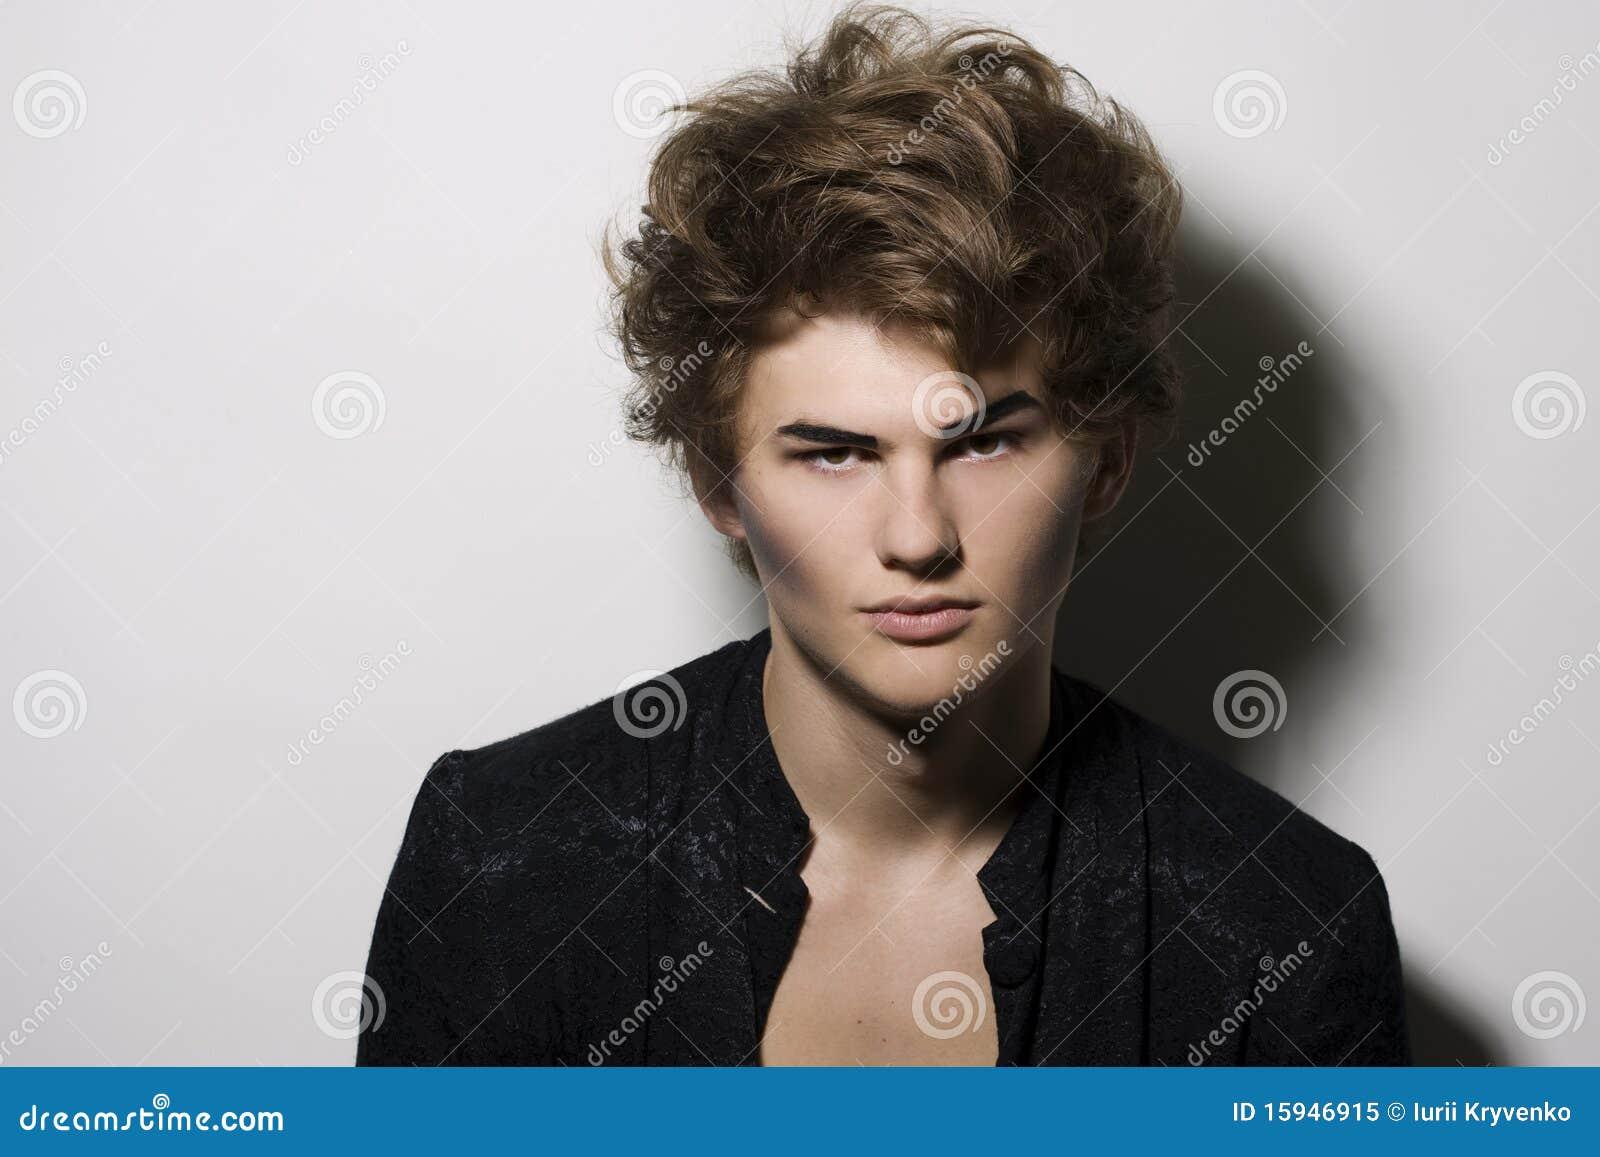 Male fashion model with stylish makeup